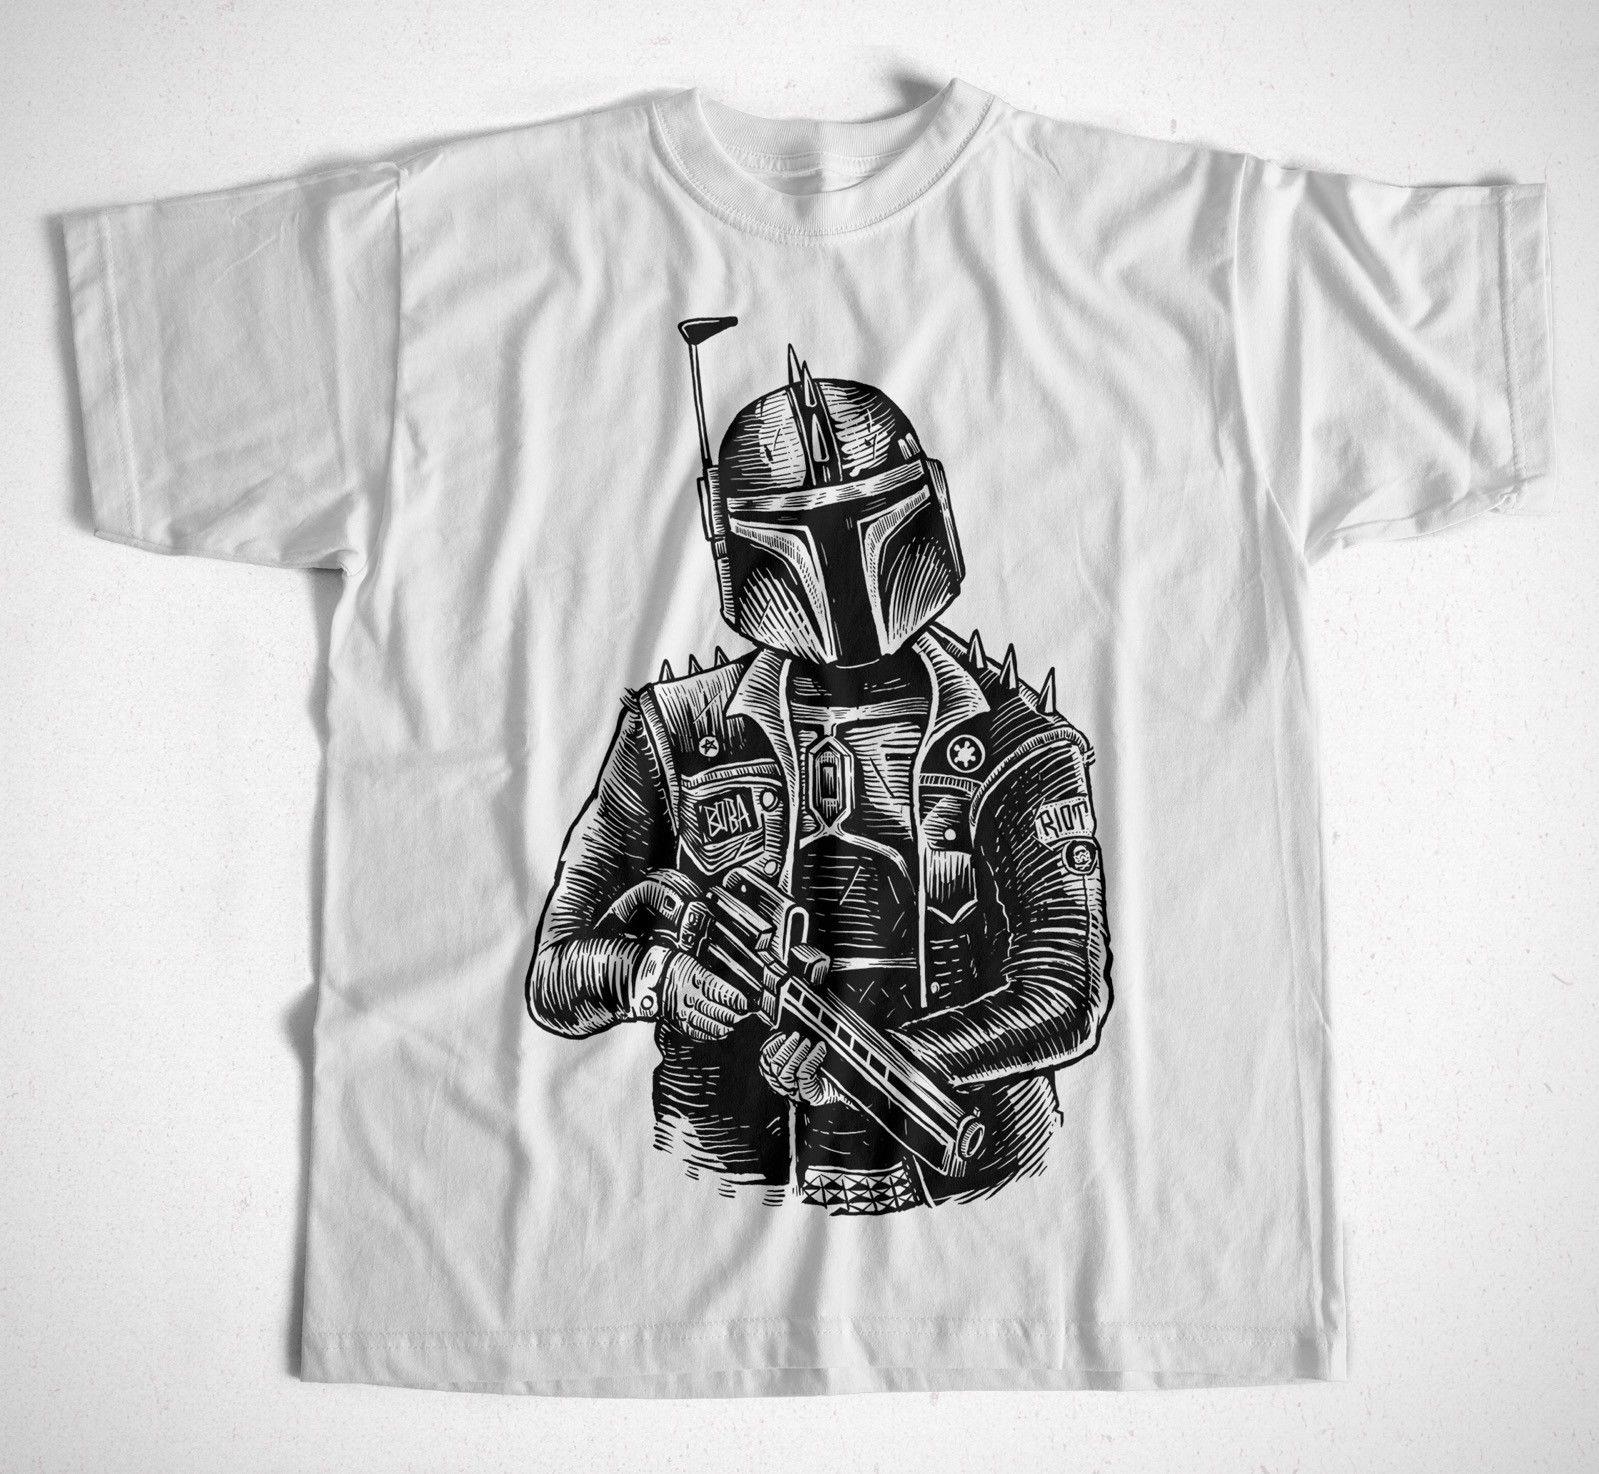 Camiseta Boba Punk S-3XL Kult Star Wars Darth Vader jedis Stormtrooper Boba Fett hombres adultos Camiseta de algodón de manga corta